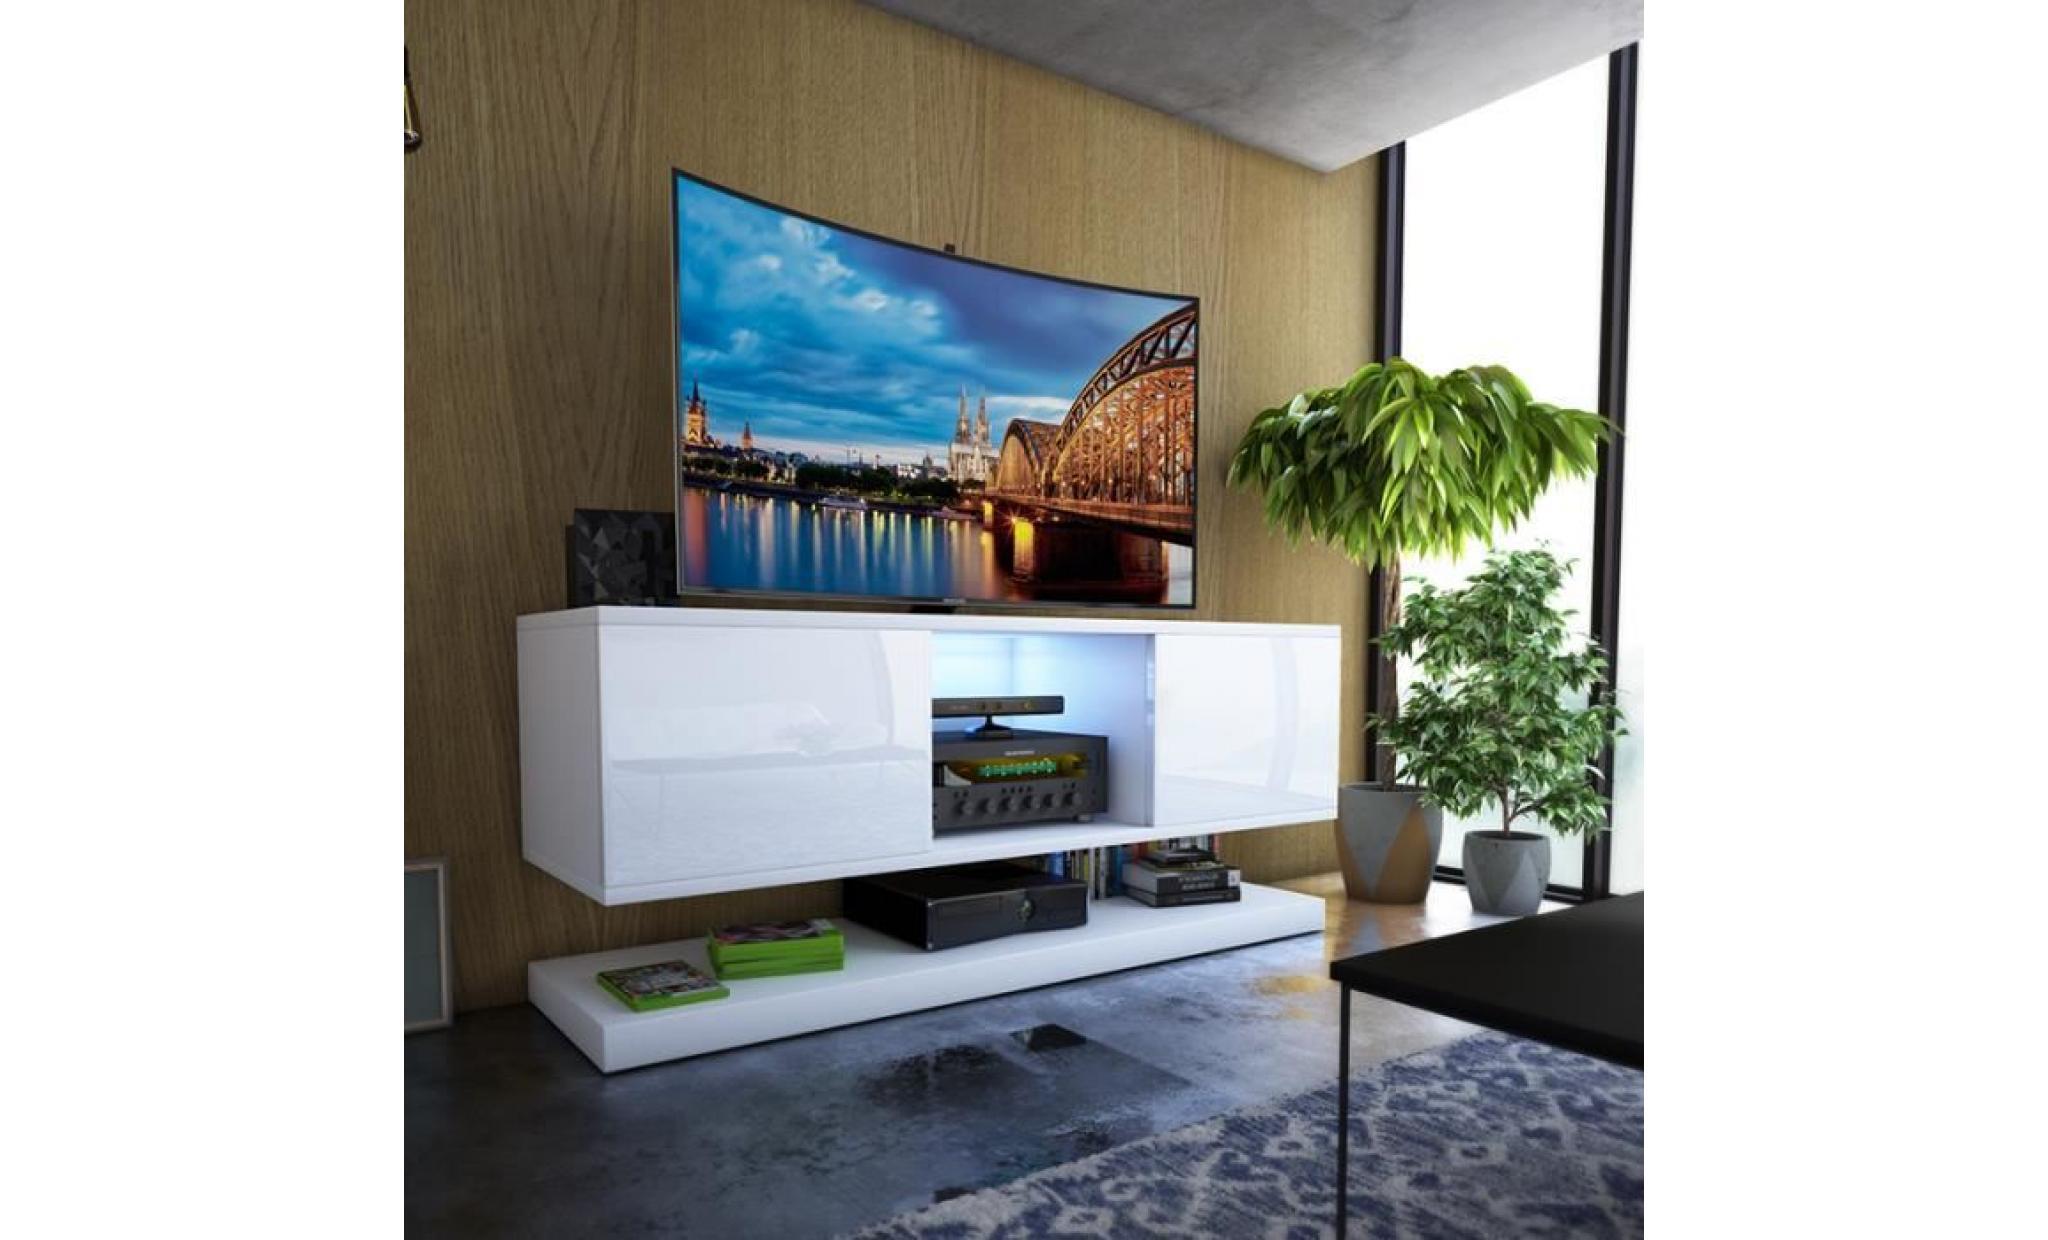 meuble tv / meuble salon wizz 140 cm blanc mat / blanc brillan avec led  style moderne meuble tv suspendu